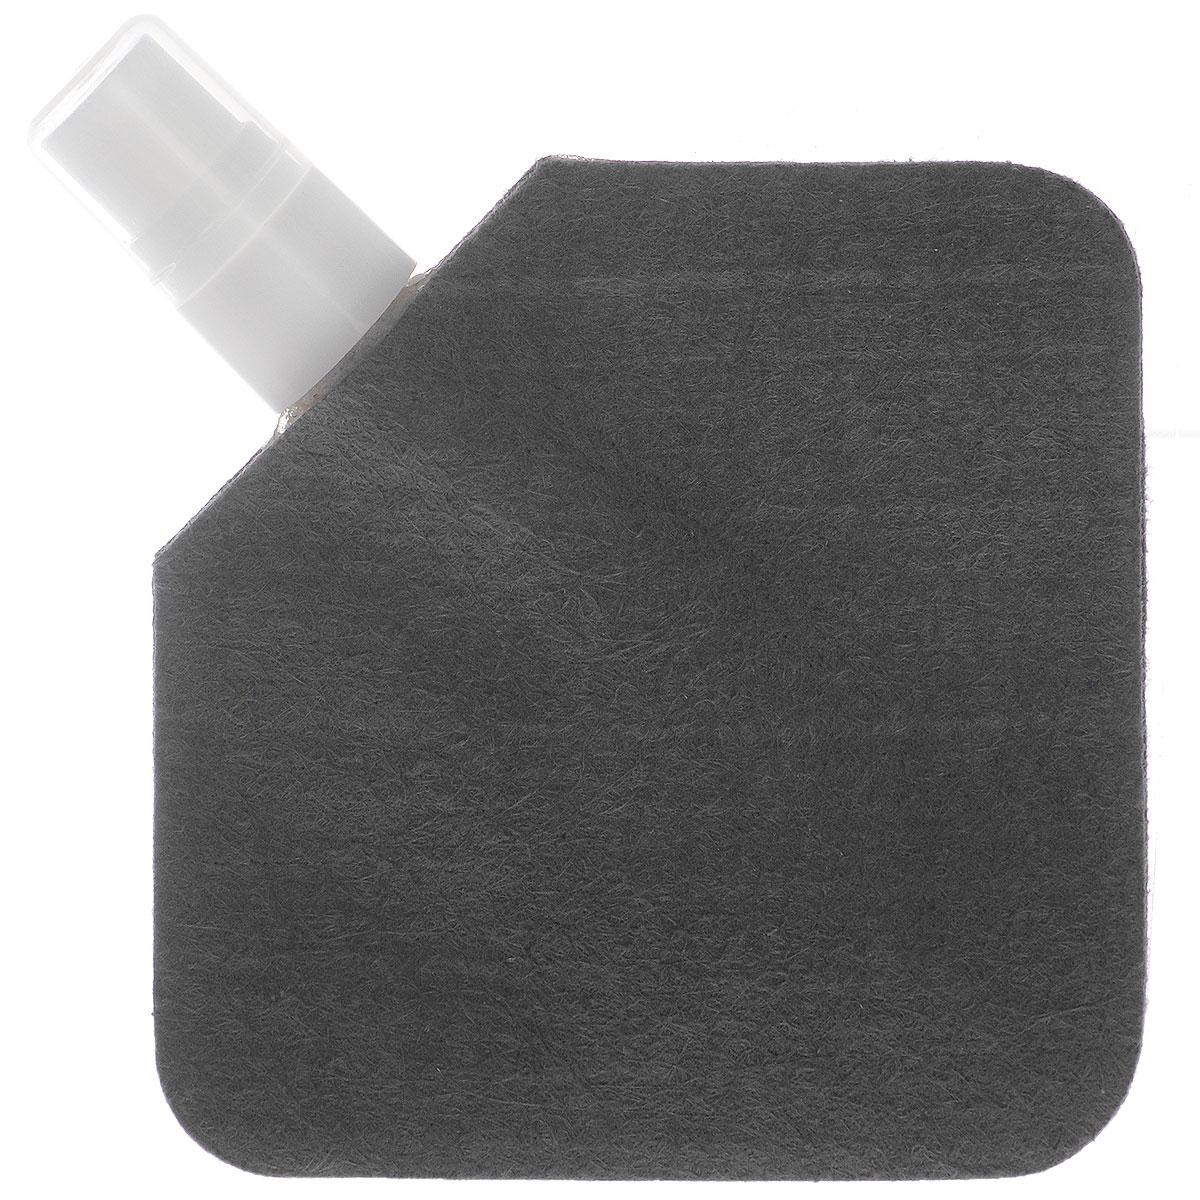 Мoderna 20475 чистящее средство-салфетка